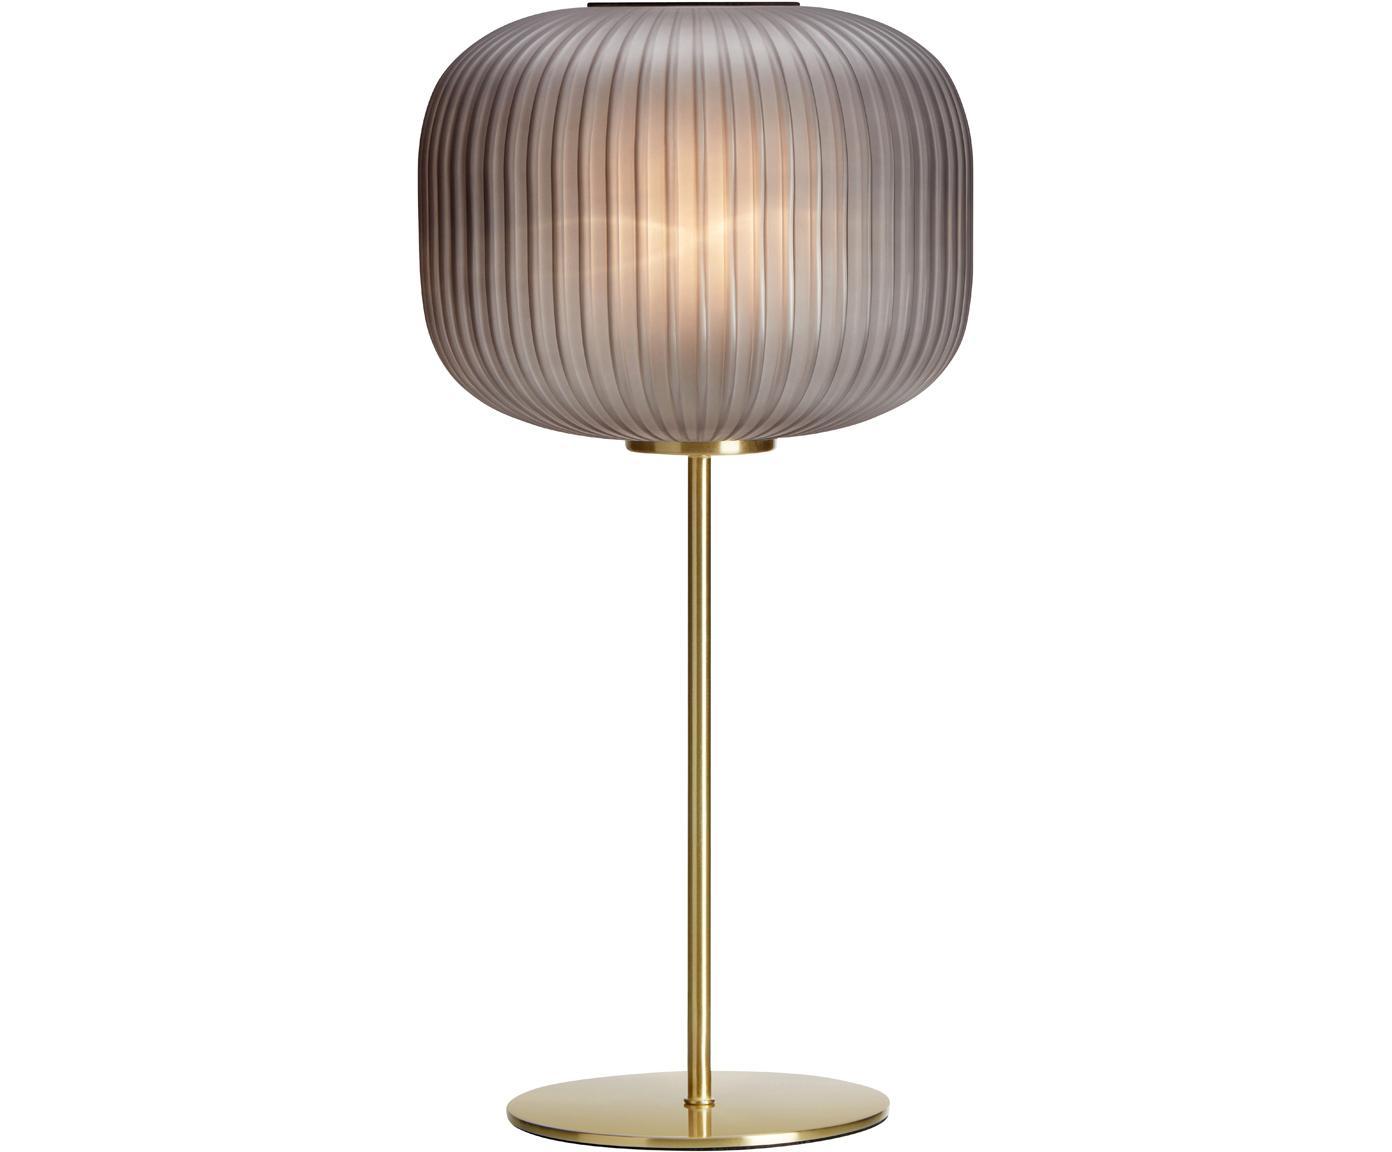 Tafellamp Sober, Glas, geborsteld metaal, Grijs, messingkleurig, Ø 25 x H 50 cm